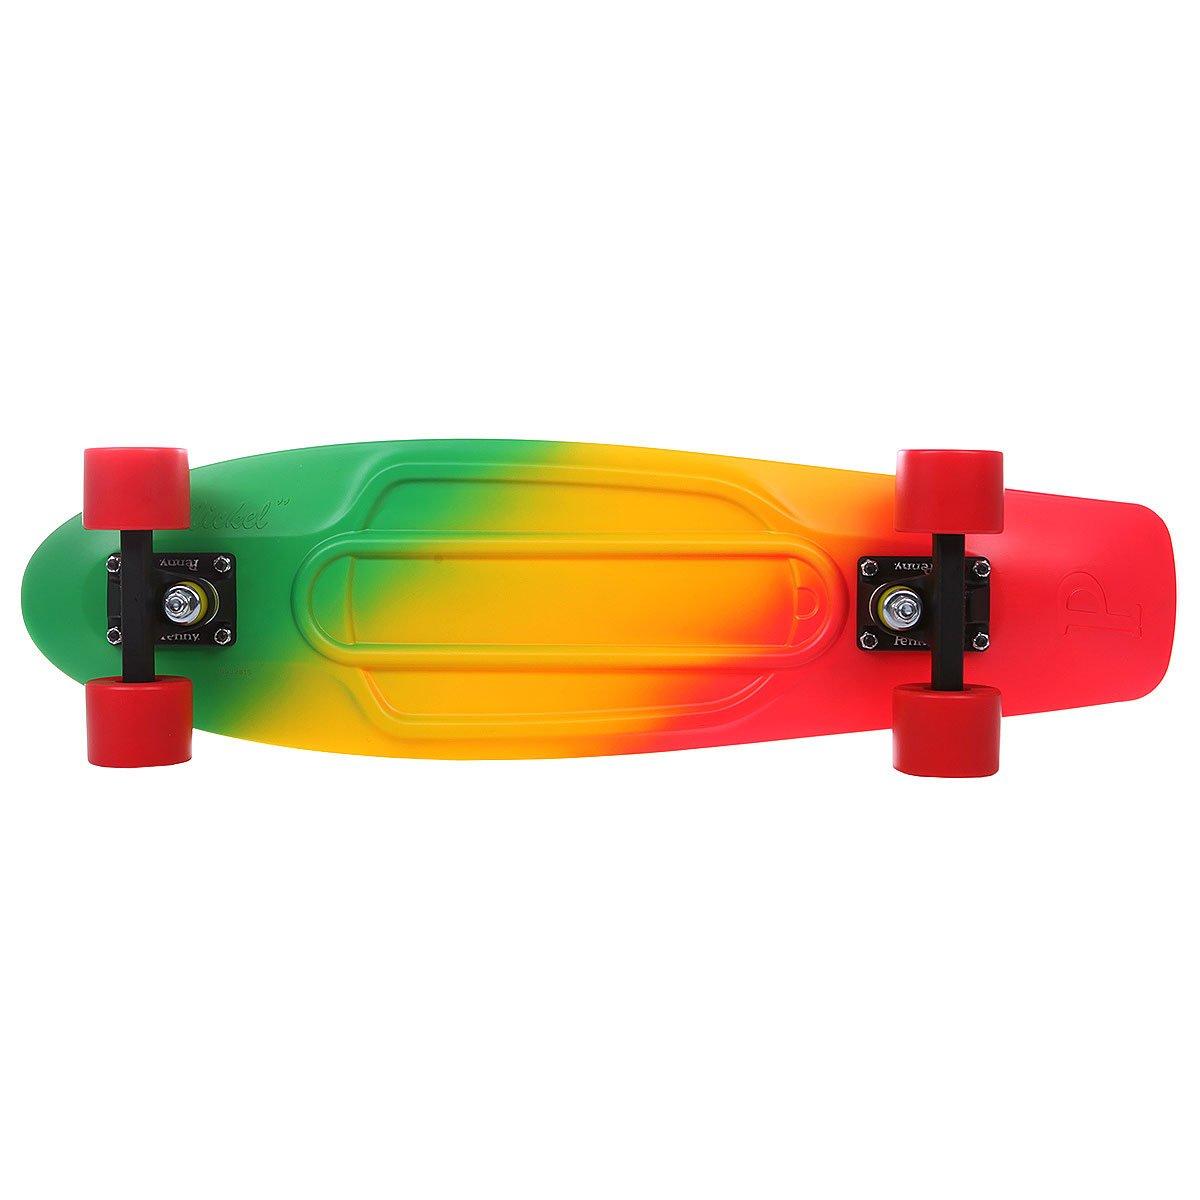 Скейт мини круизер Penny Nickel 27 Ltd Hosoi Signature 27 (68.6 см)